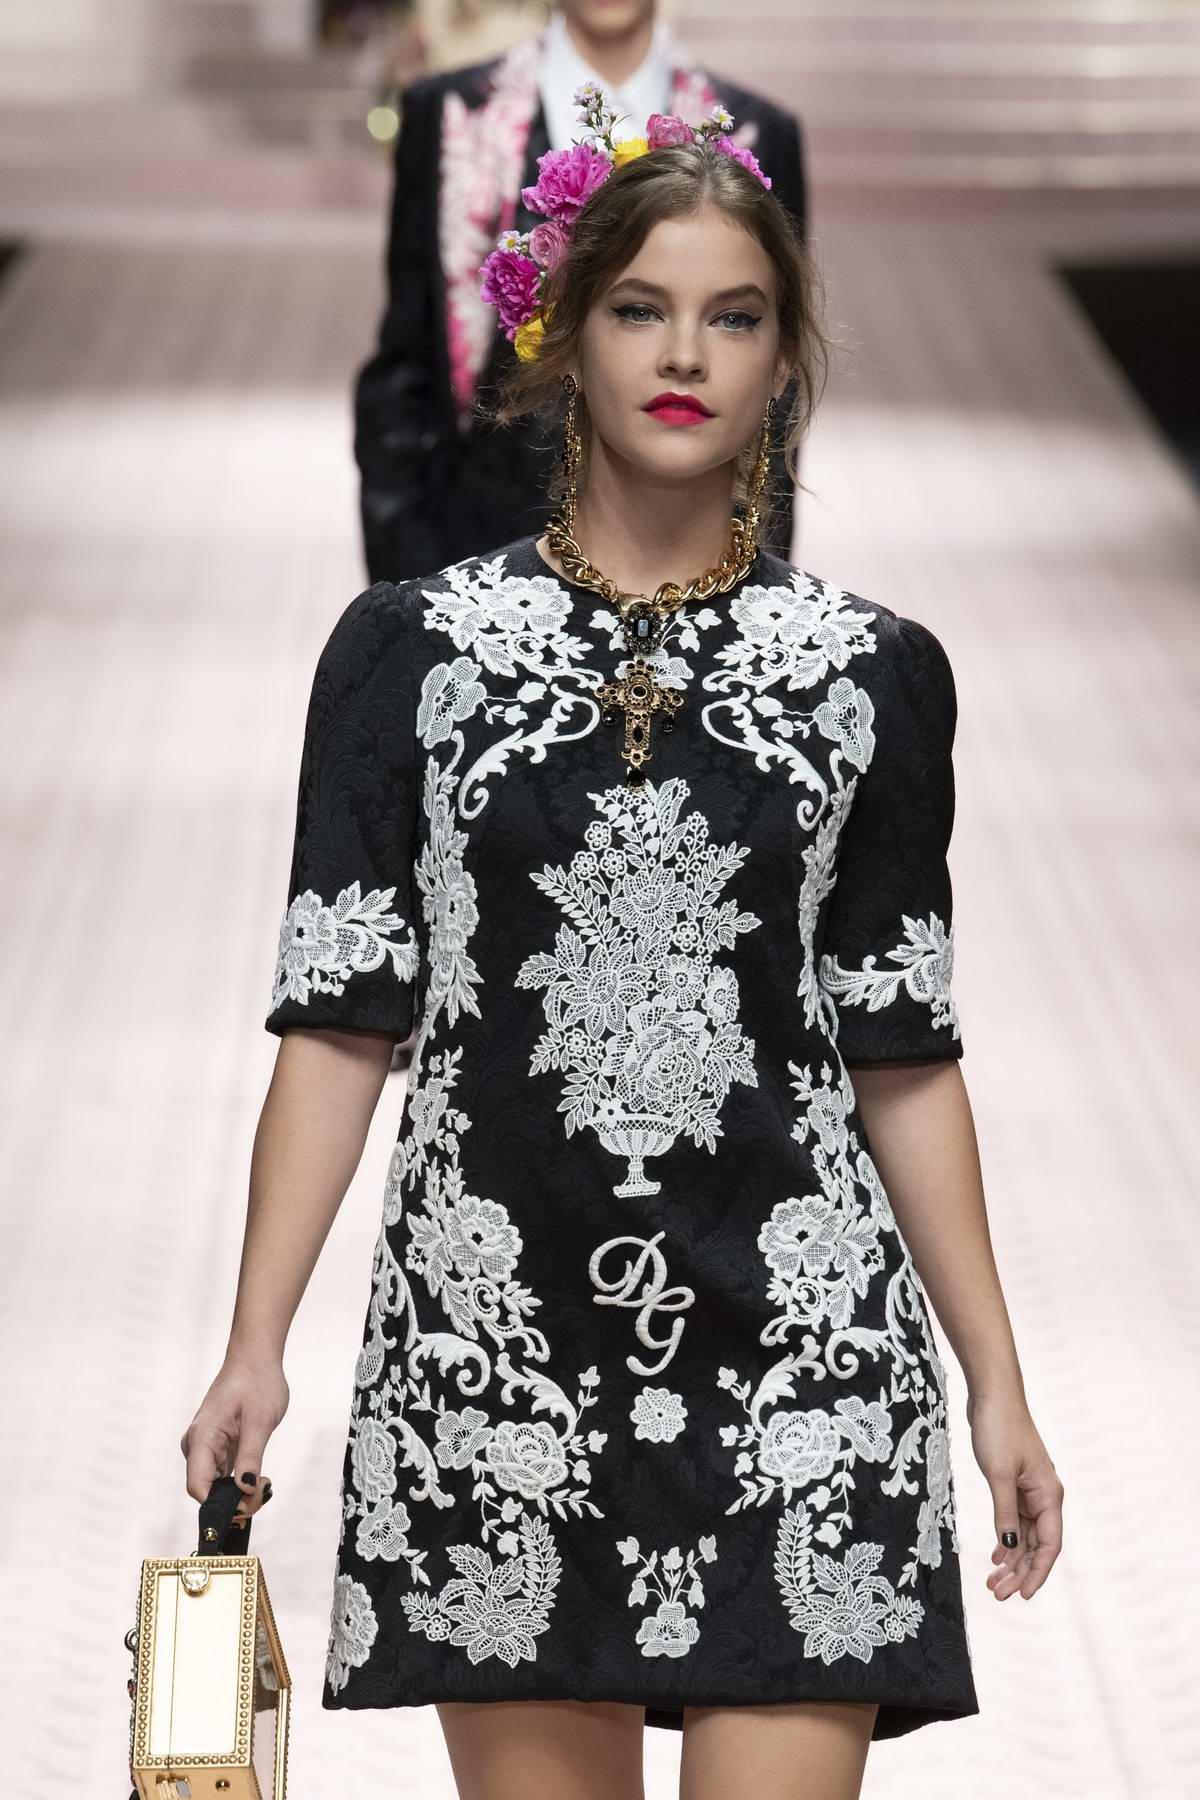 68cecfc1 barbara palvin walks the runway for dolce & gabbana fashion show,  spring-summer 2019 during milan fashion week in milan, italy-230918_8